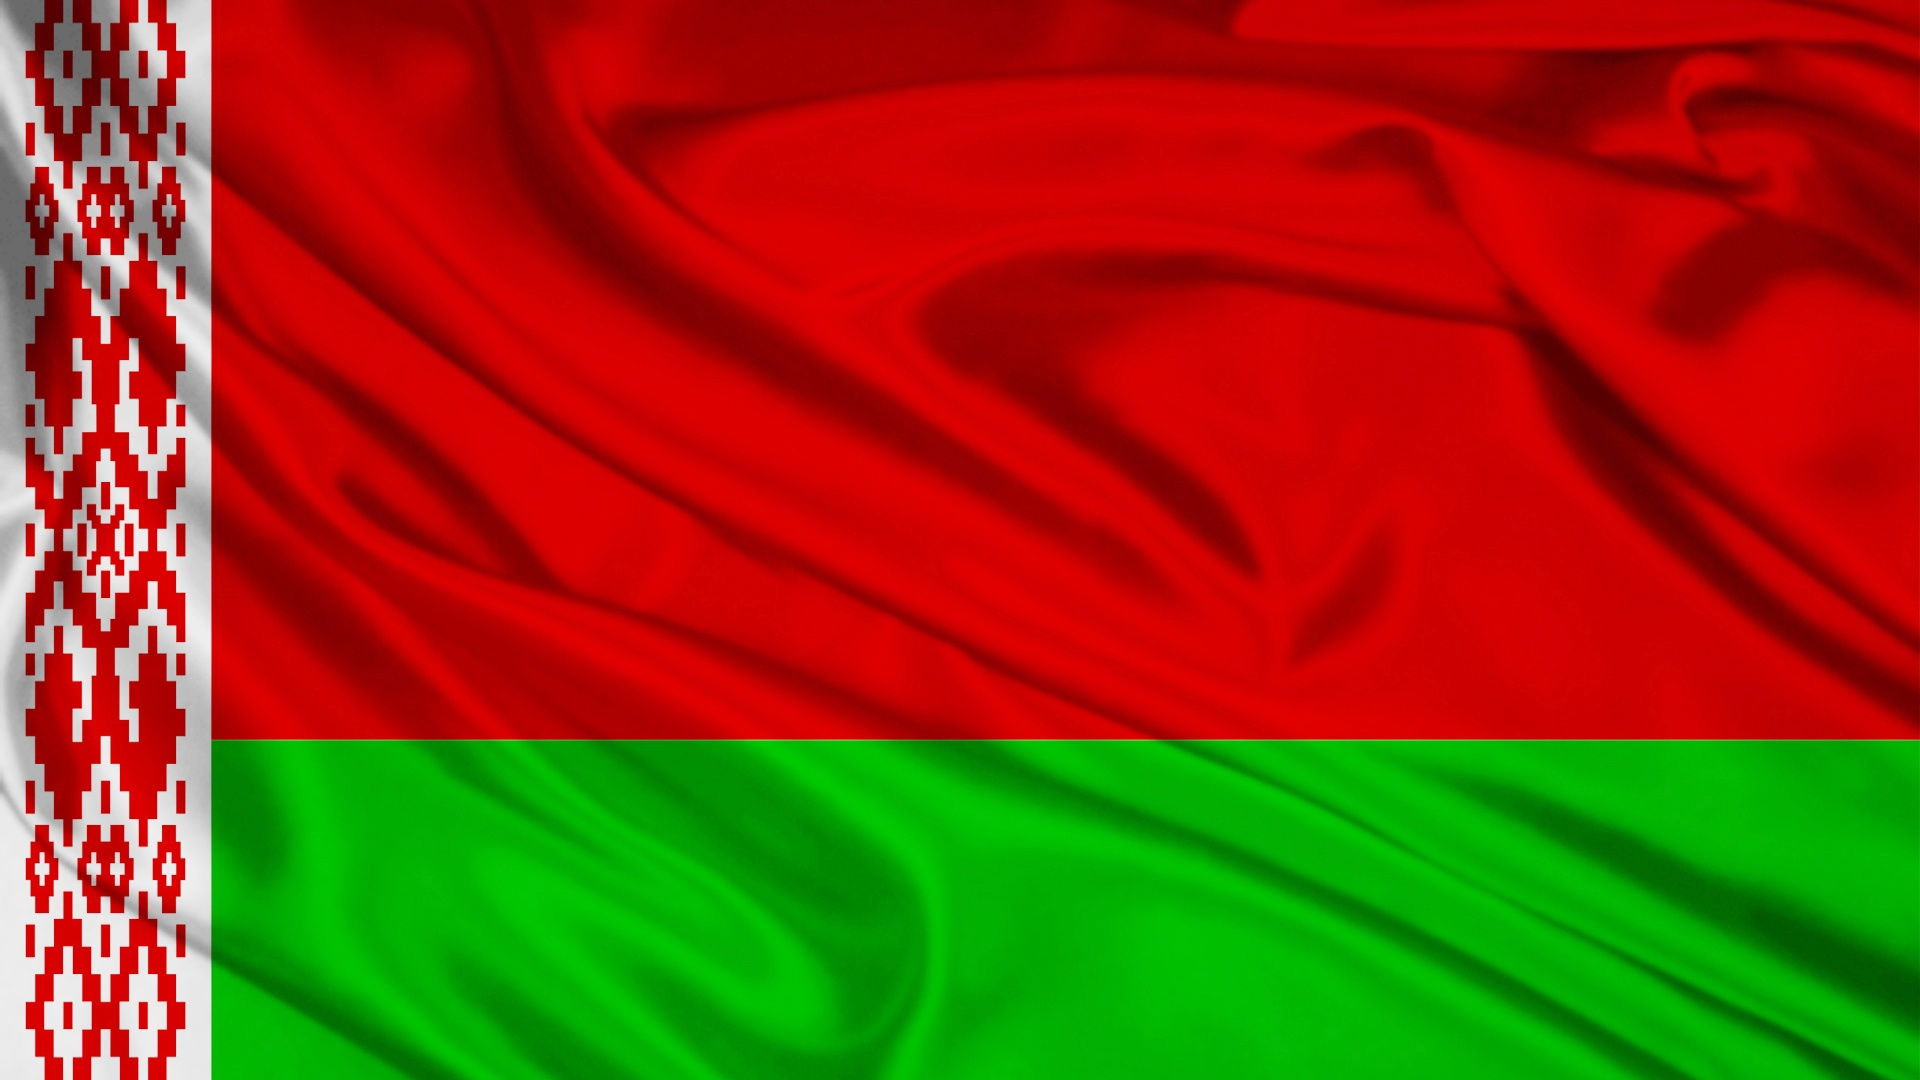 Белоруссия, belorussia, флаг, flag